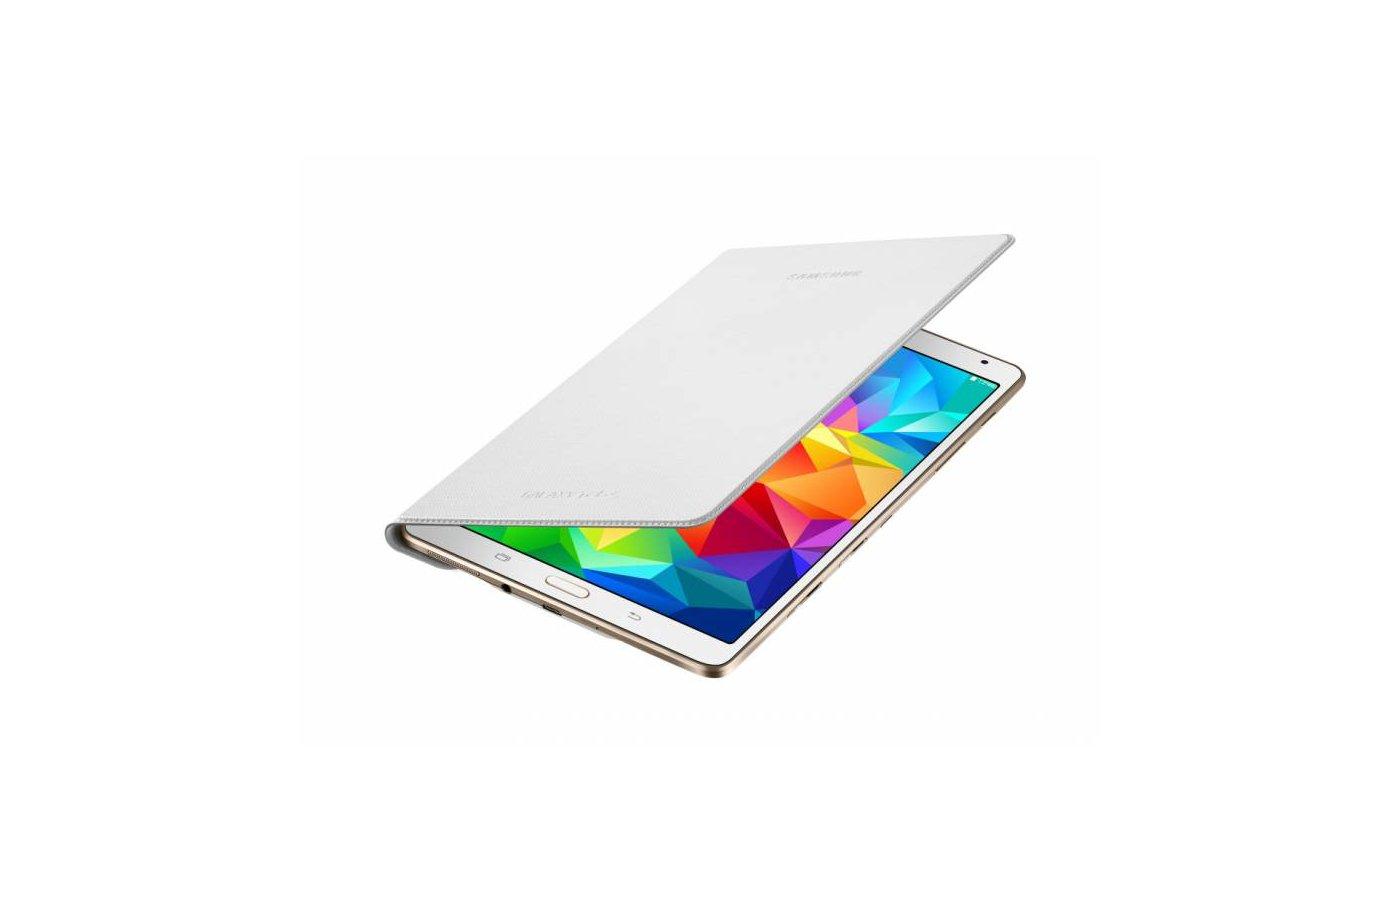 Чехол для планшетного ПК Samsung для Galaxy Tab S 8.4 SM-T700 Simple Cover (EF-DT700BWEGRU) пластик белый